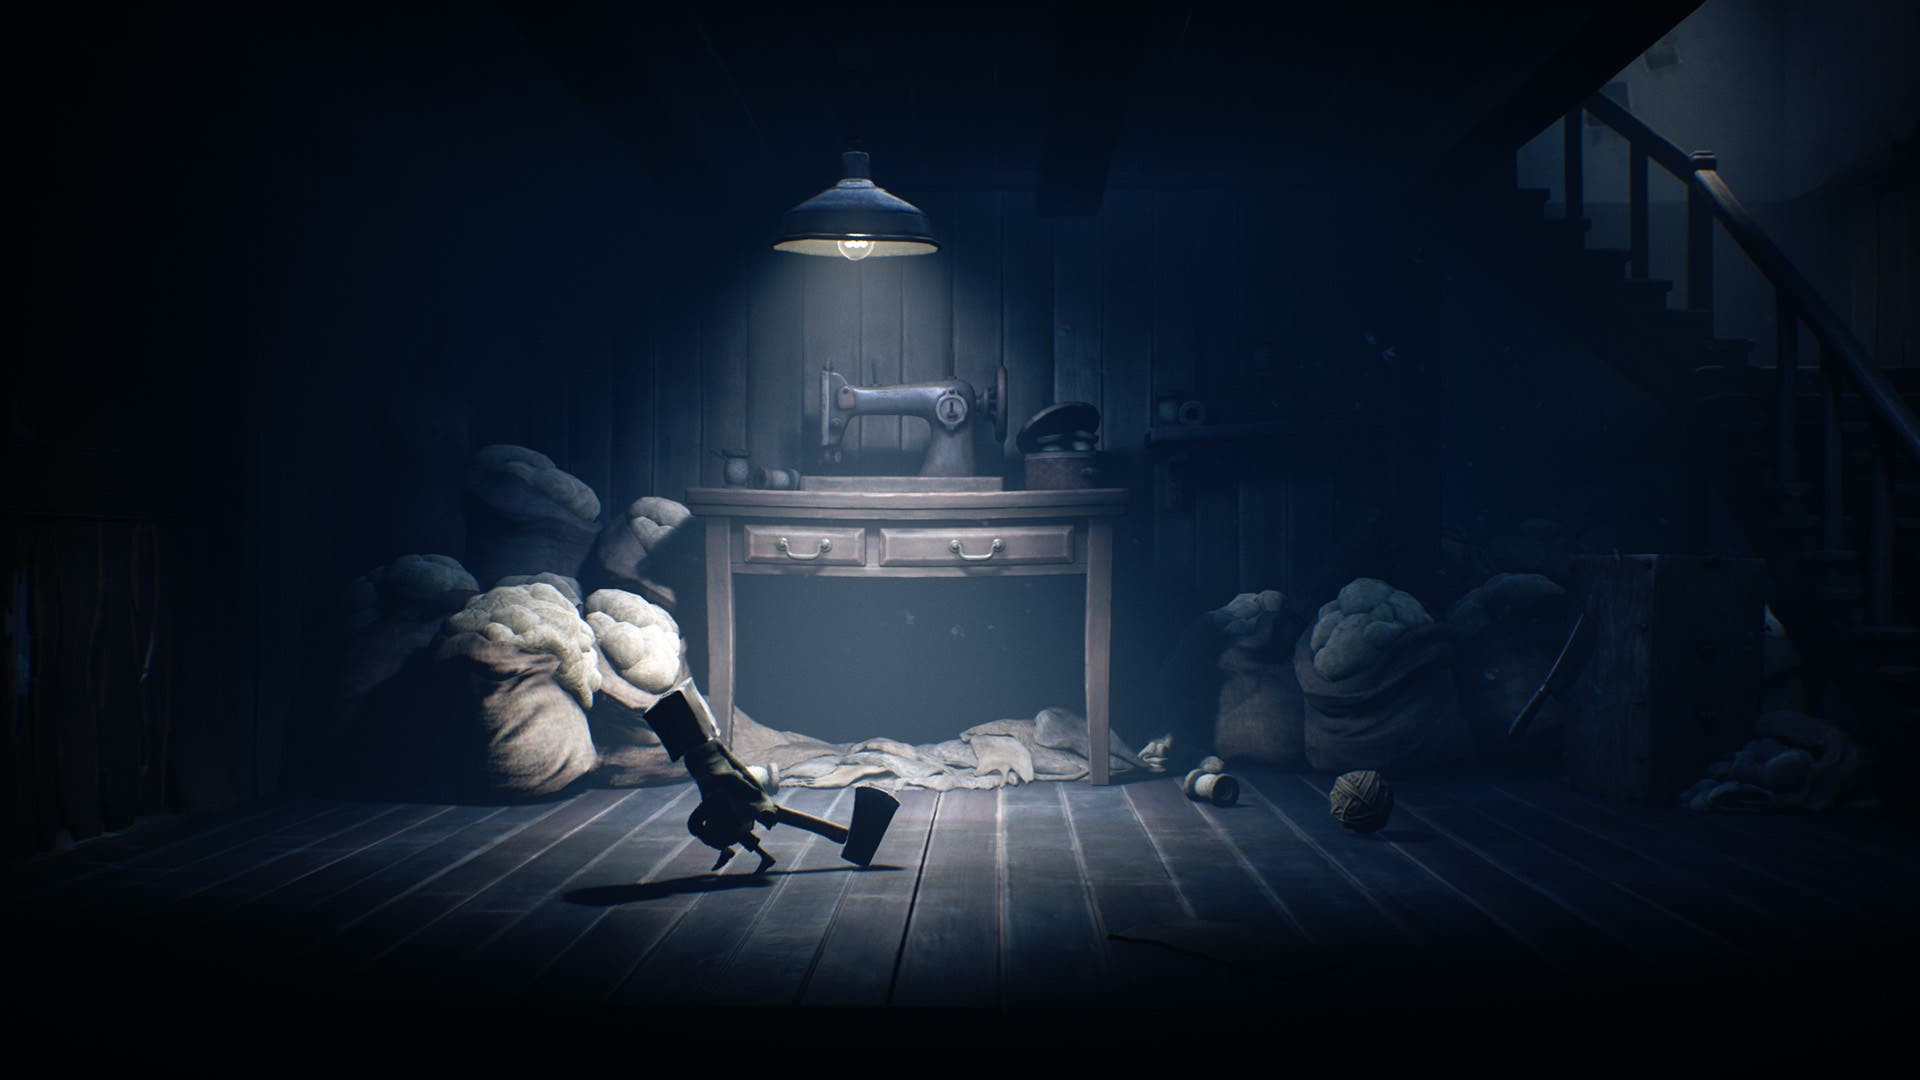 Análisis de Little Nightmares 2 - Xbox One 1